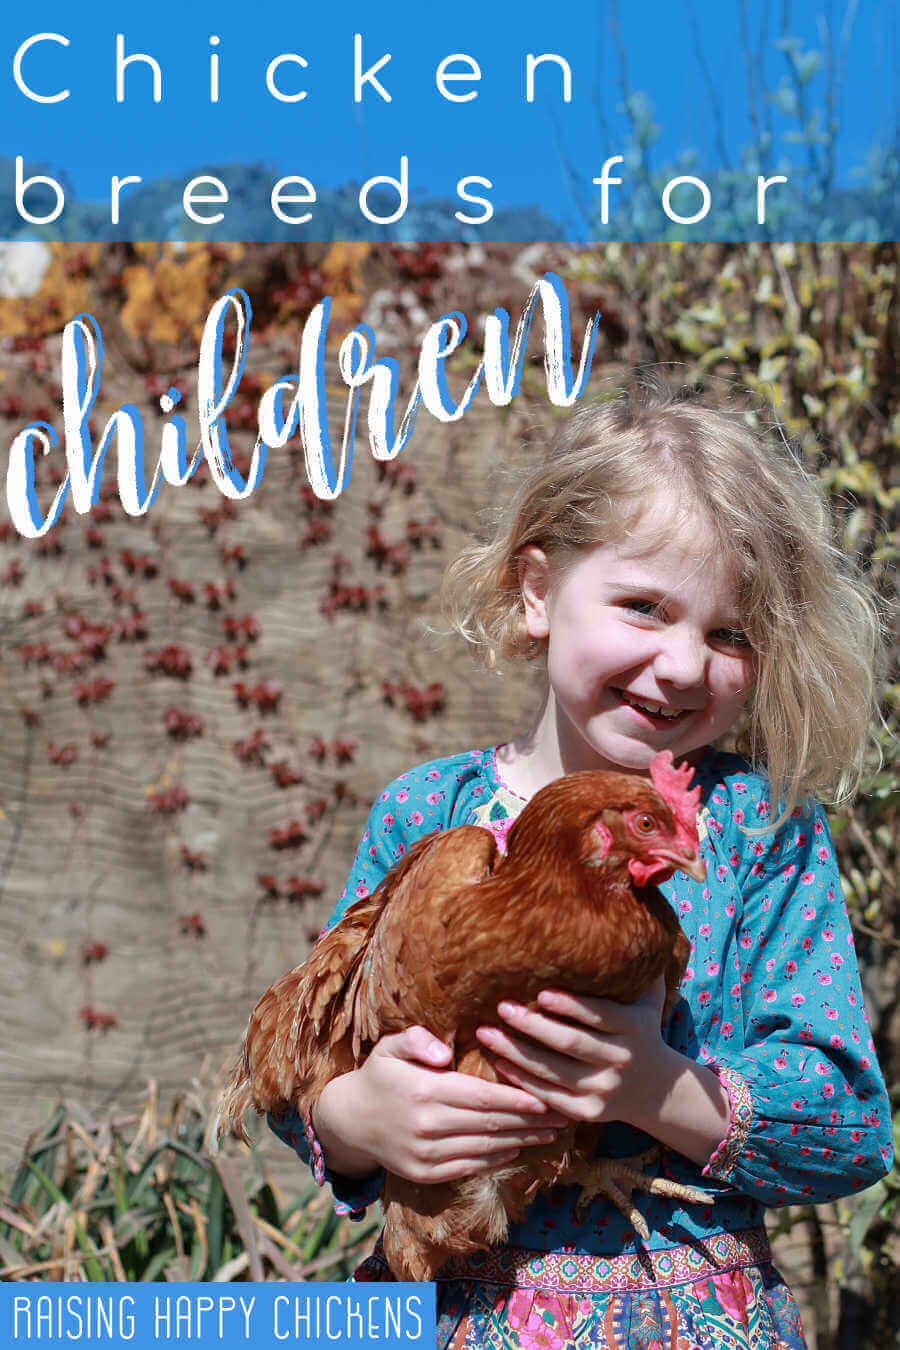 Chickens and children